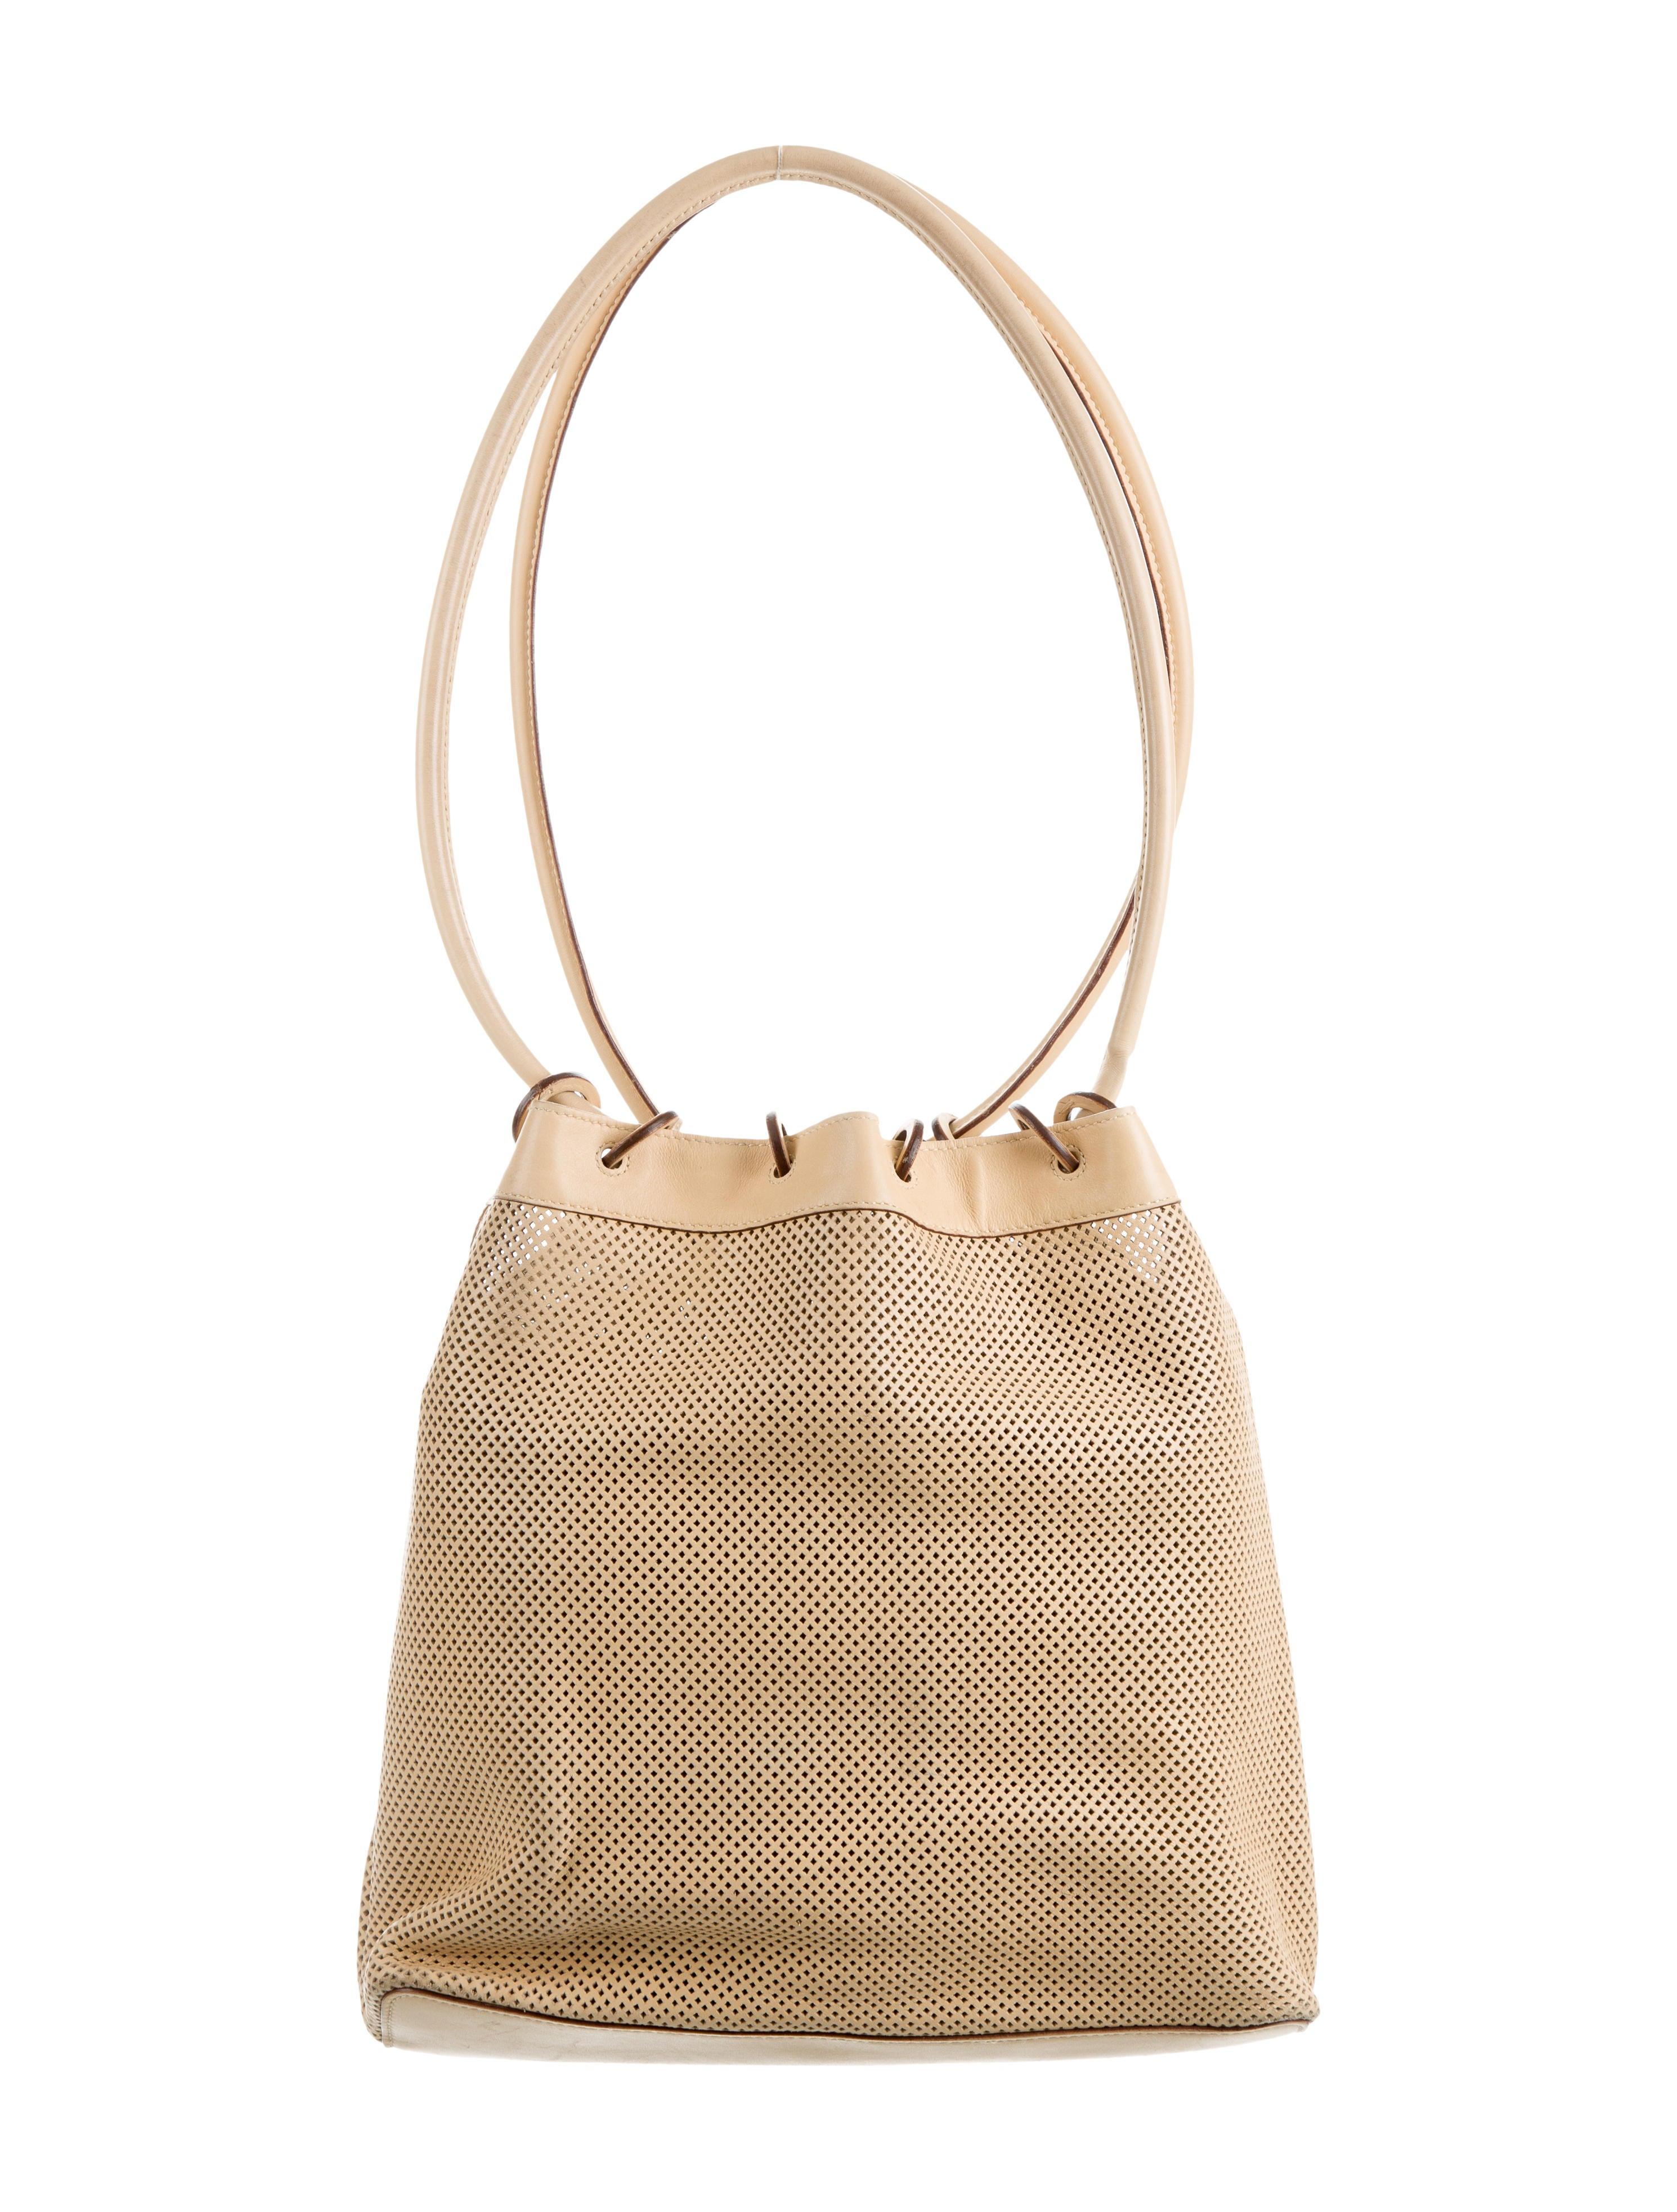 Gucci Perforated Bucket Bag Handbags Guc153172 The